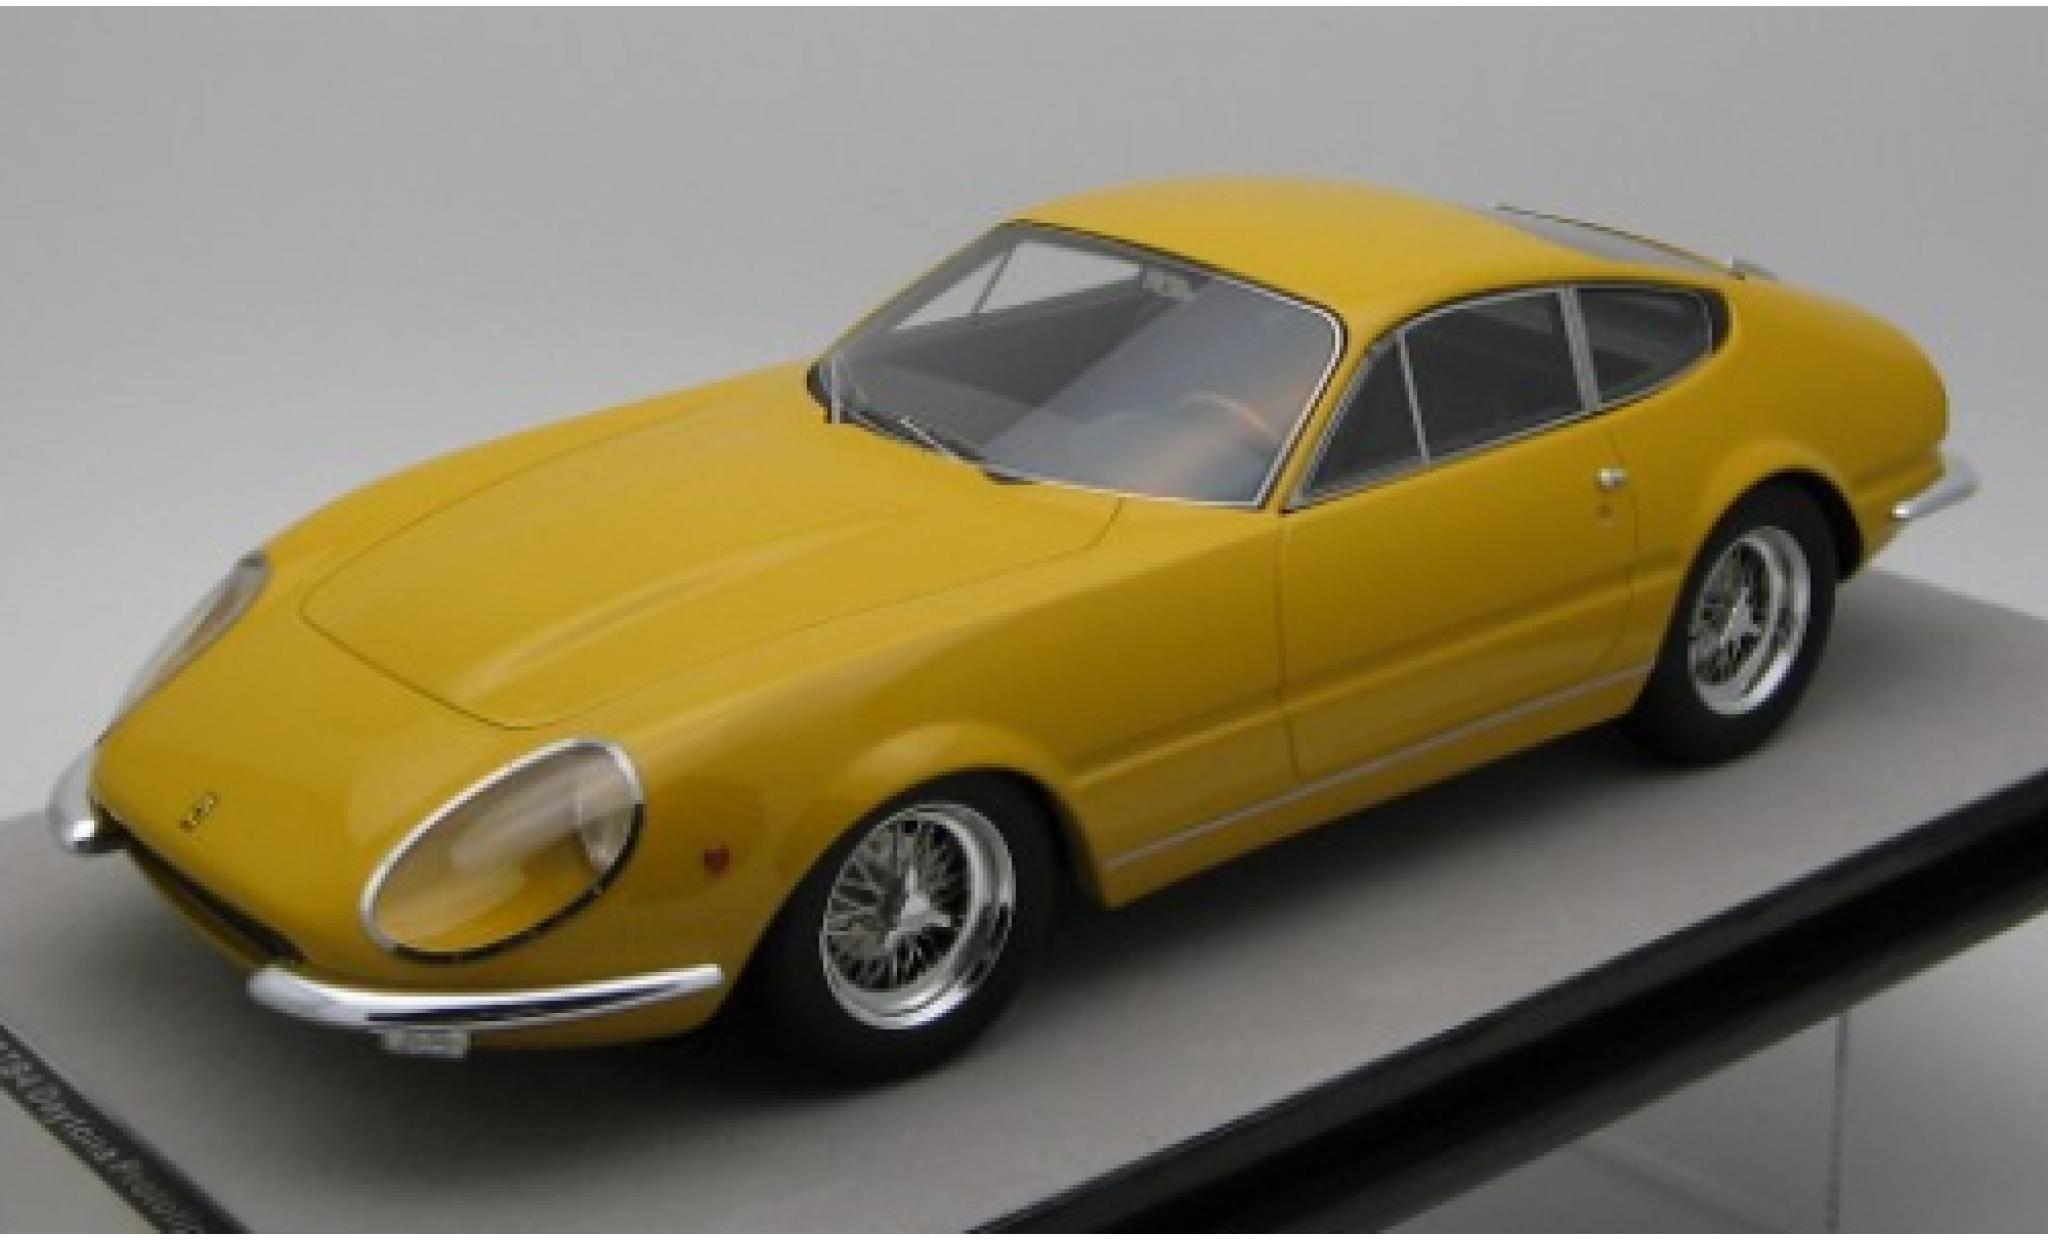 Ferrari 365 1/18 Tecnomodel GTB/4 Daytona Prossootipo giallo 1967